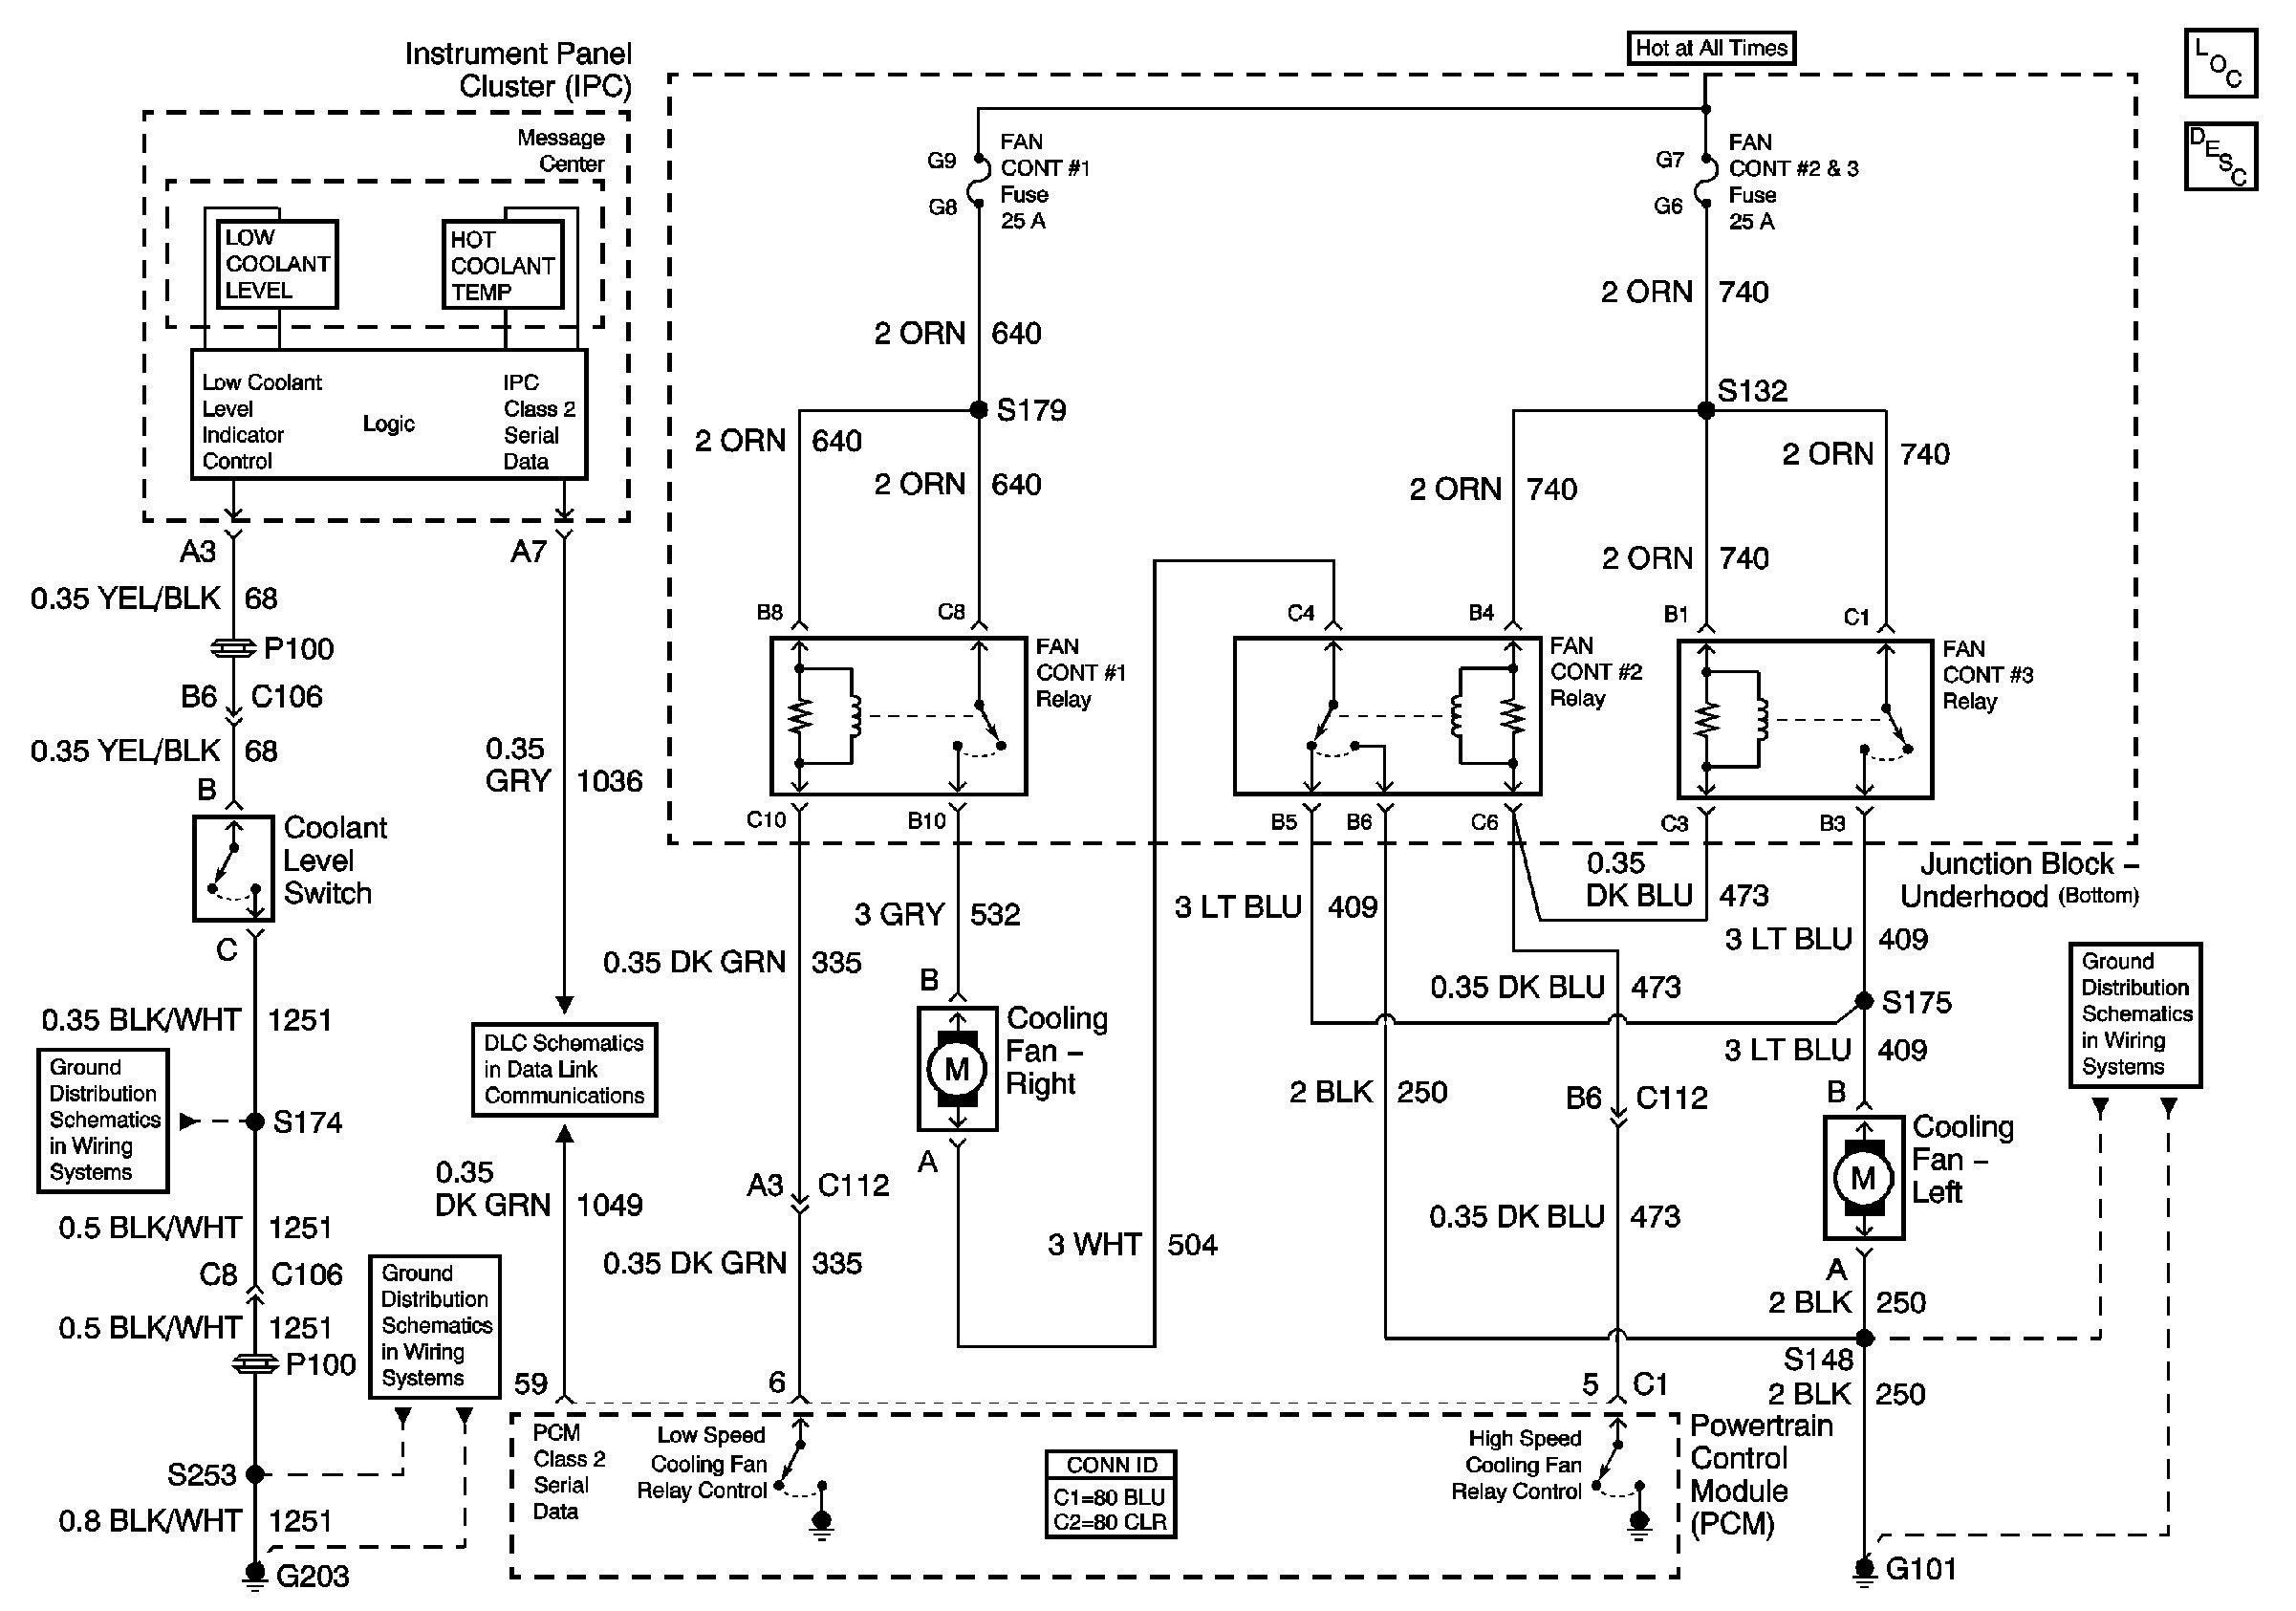 c6 wiring diagrams unique wiring diagram for electric fan relay diagram  wiring diagram for electric fan relay